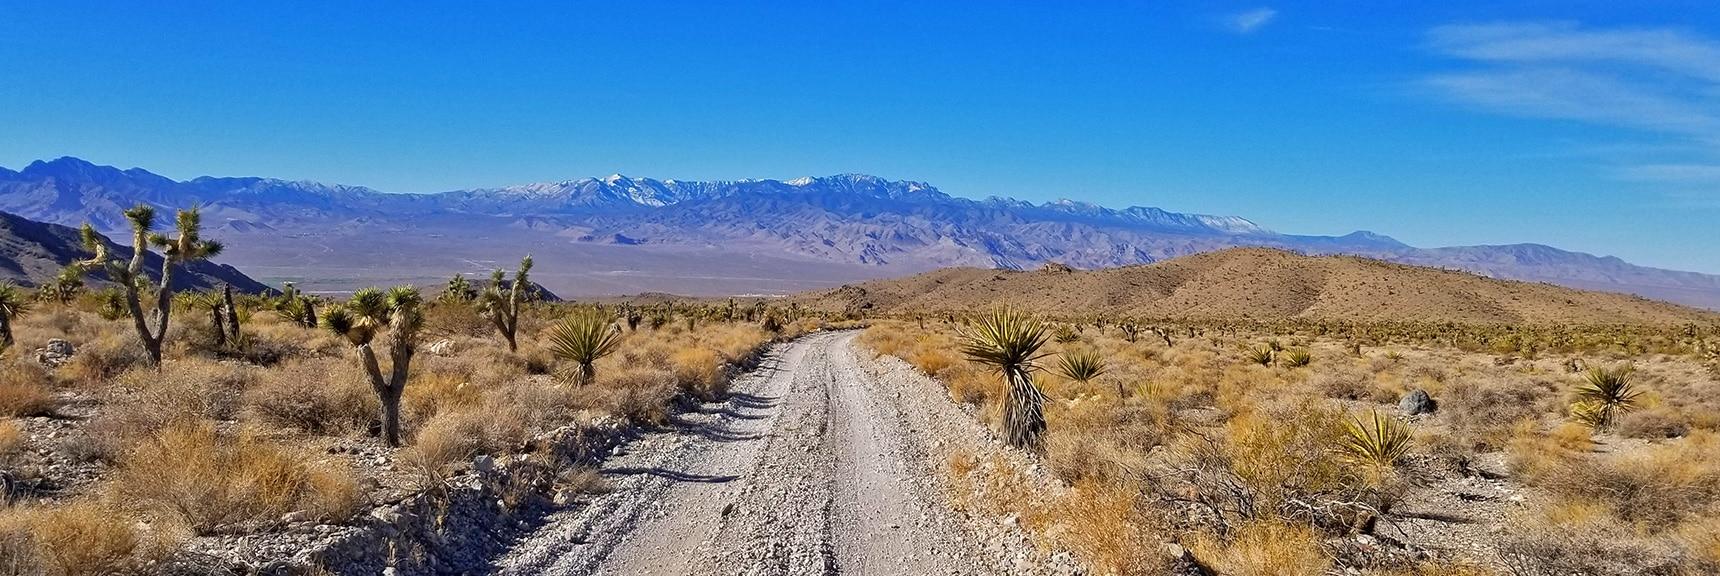 View Down Gass Peak Road Toward Mt. Charleston Wilderness | Gass Peak Road Circuit | Desert National Wildlife Refuge | Nevada